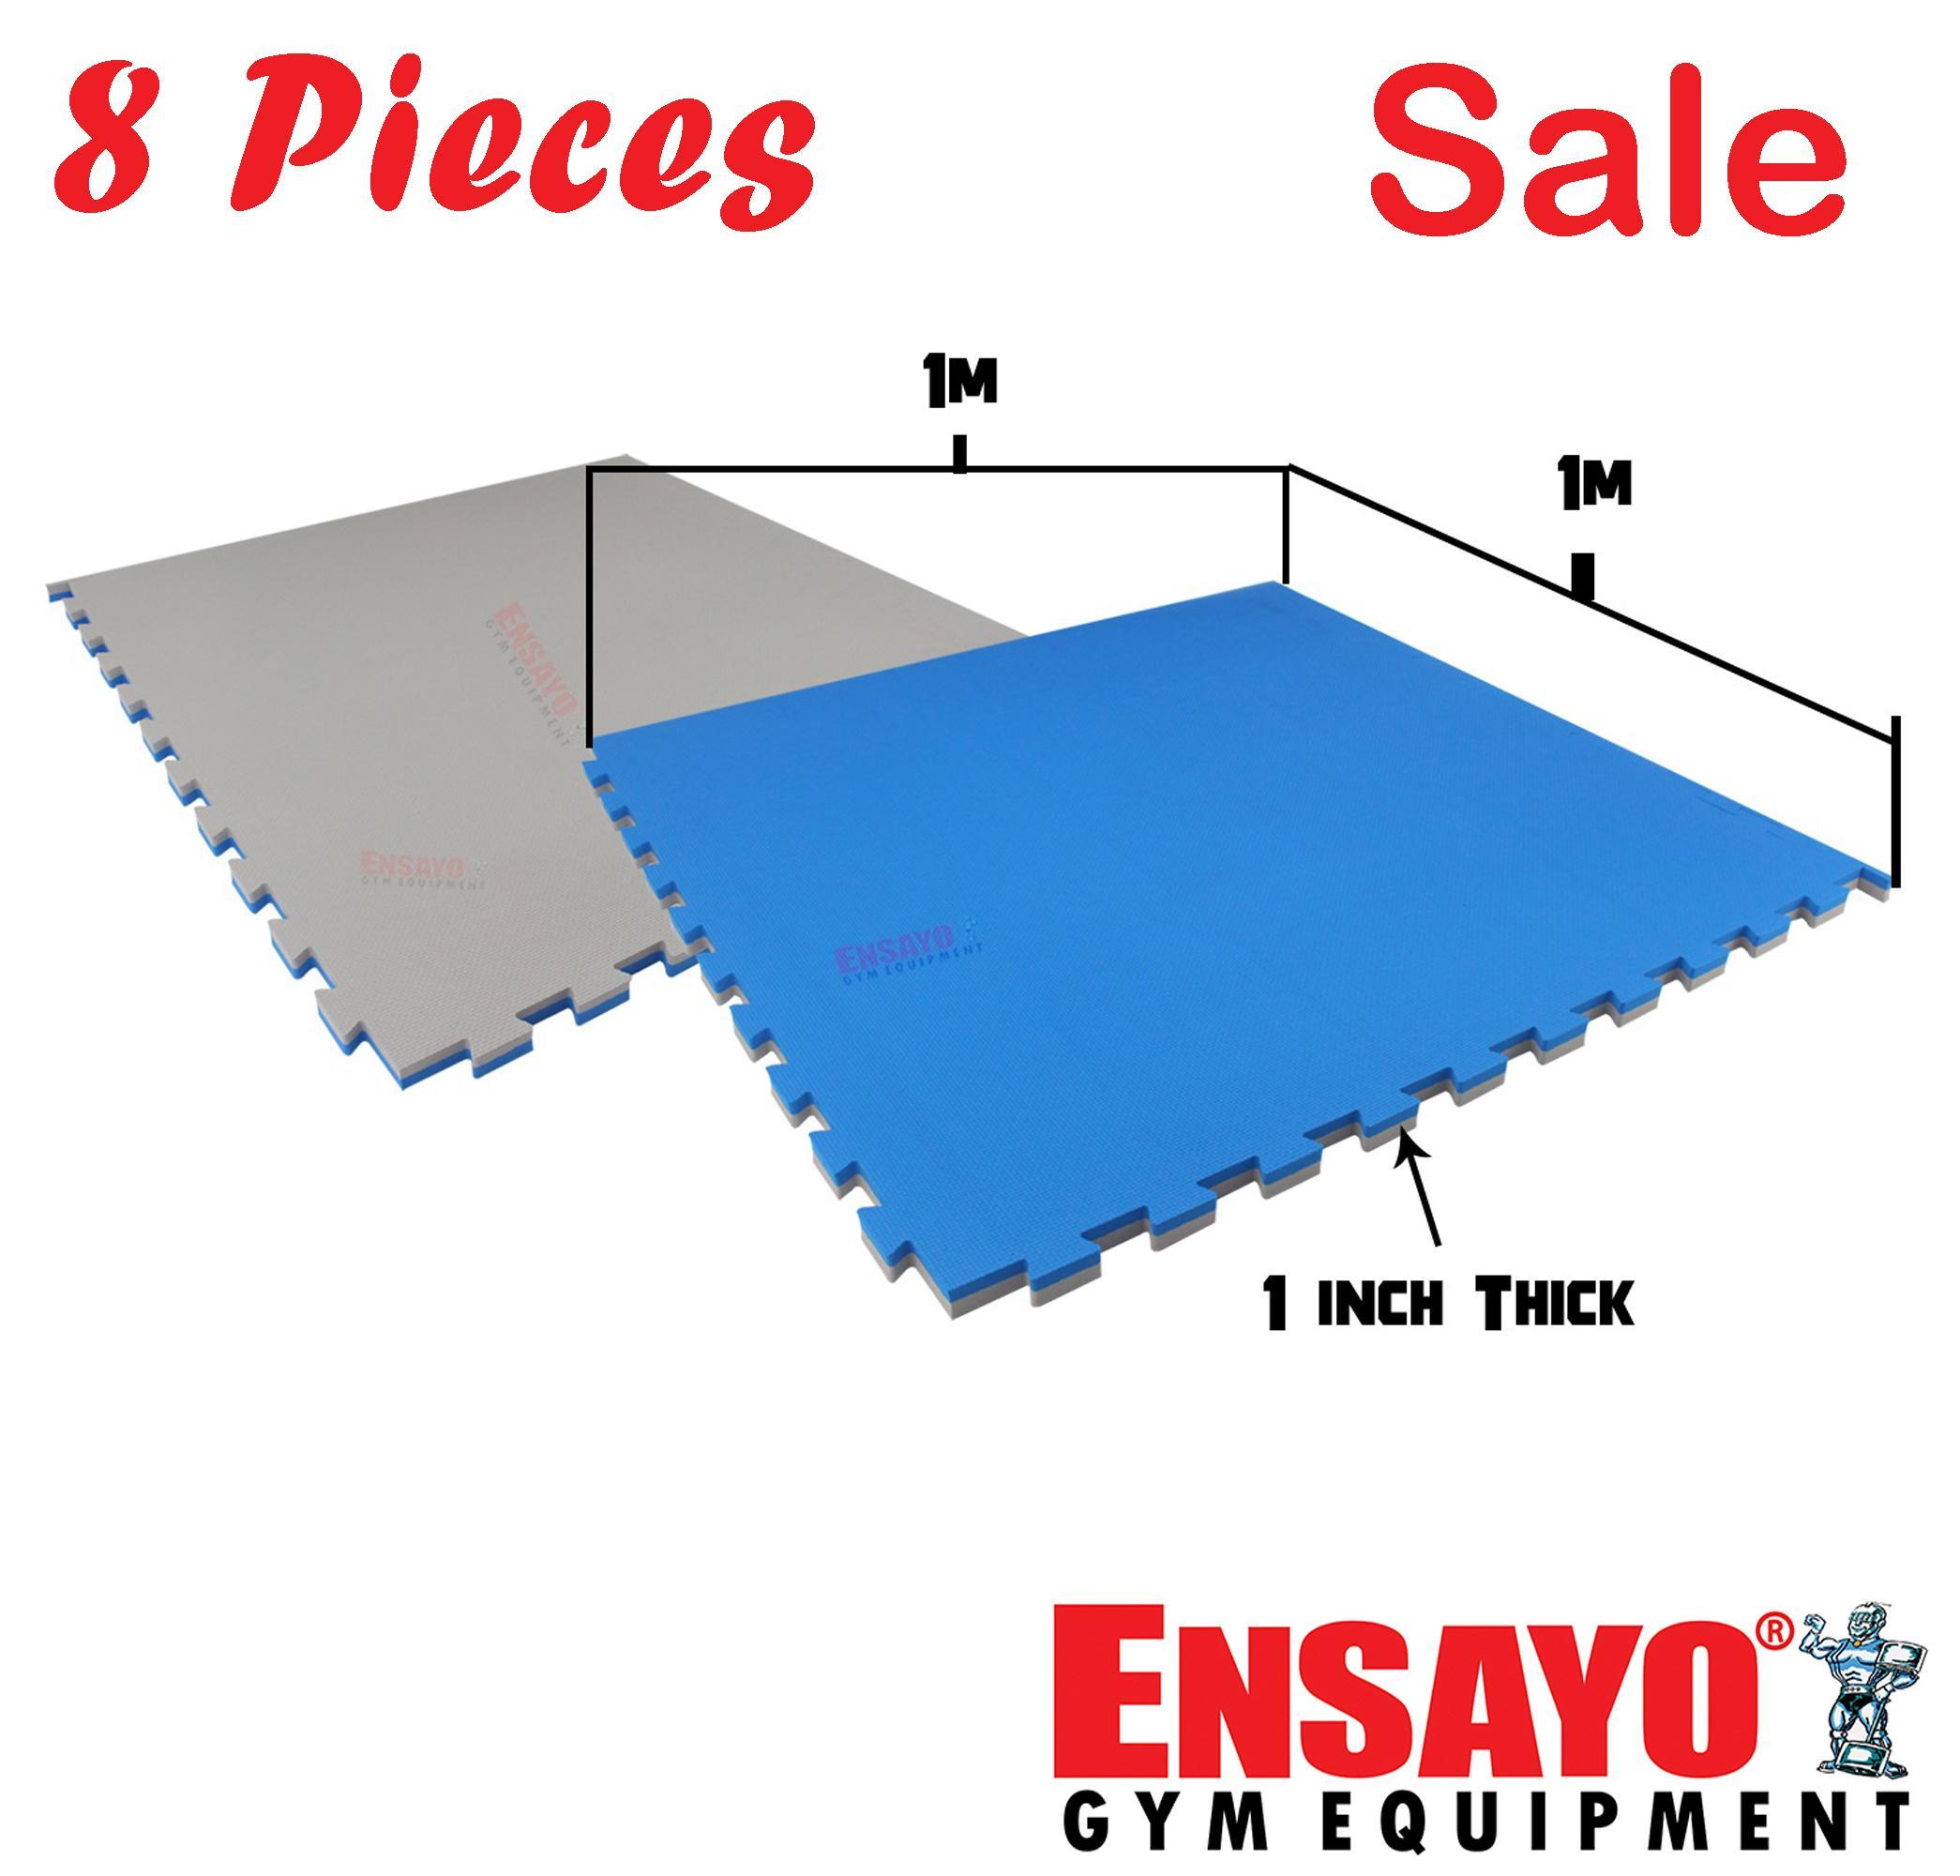 ENSAYO 8pcs  Low Density Mats Blue/Gray 1x1 meter x 1-inch Best  Home/Commercial gym (  Exercise/Workout/Judo/Gymnastics/Jiu-jitsu/Yoga/Grappling/Streng